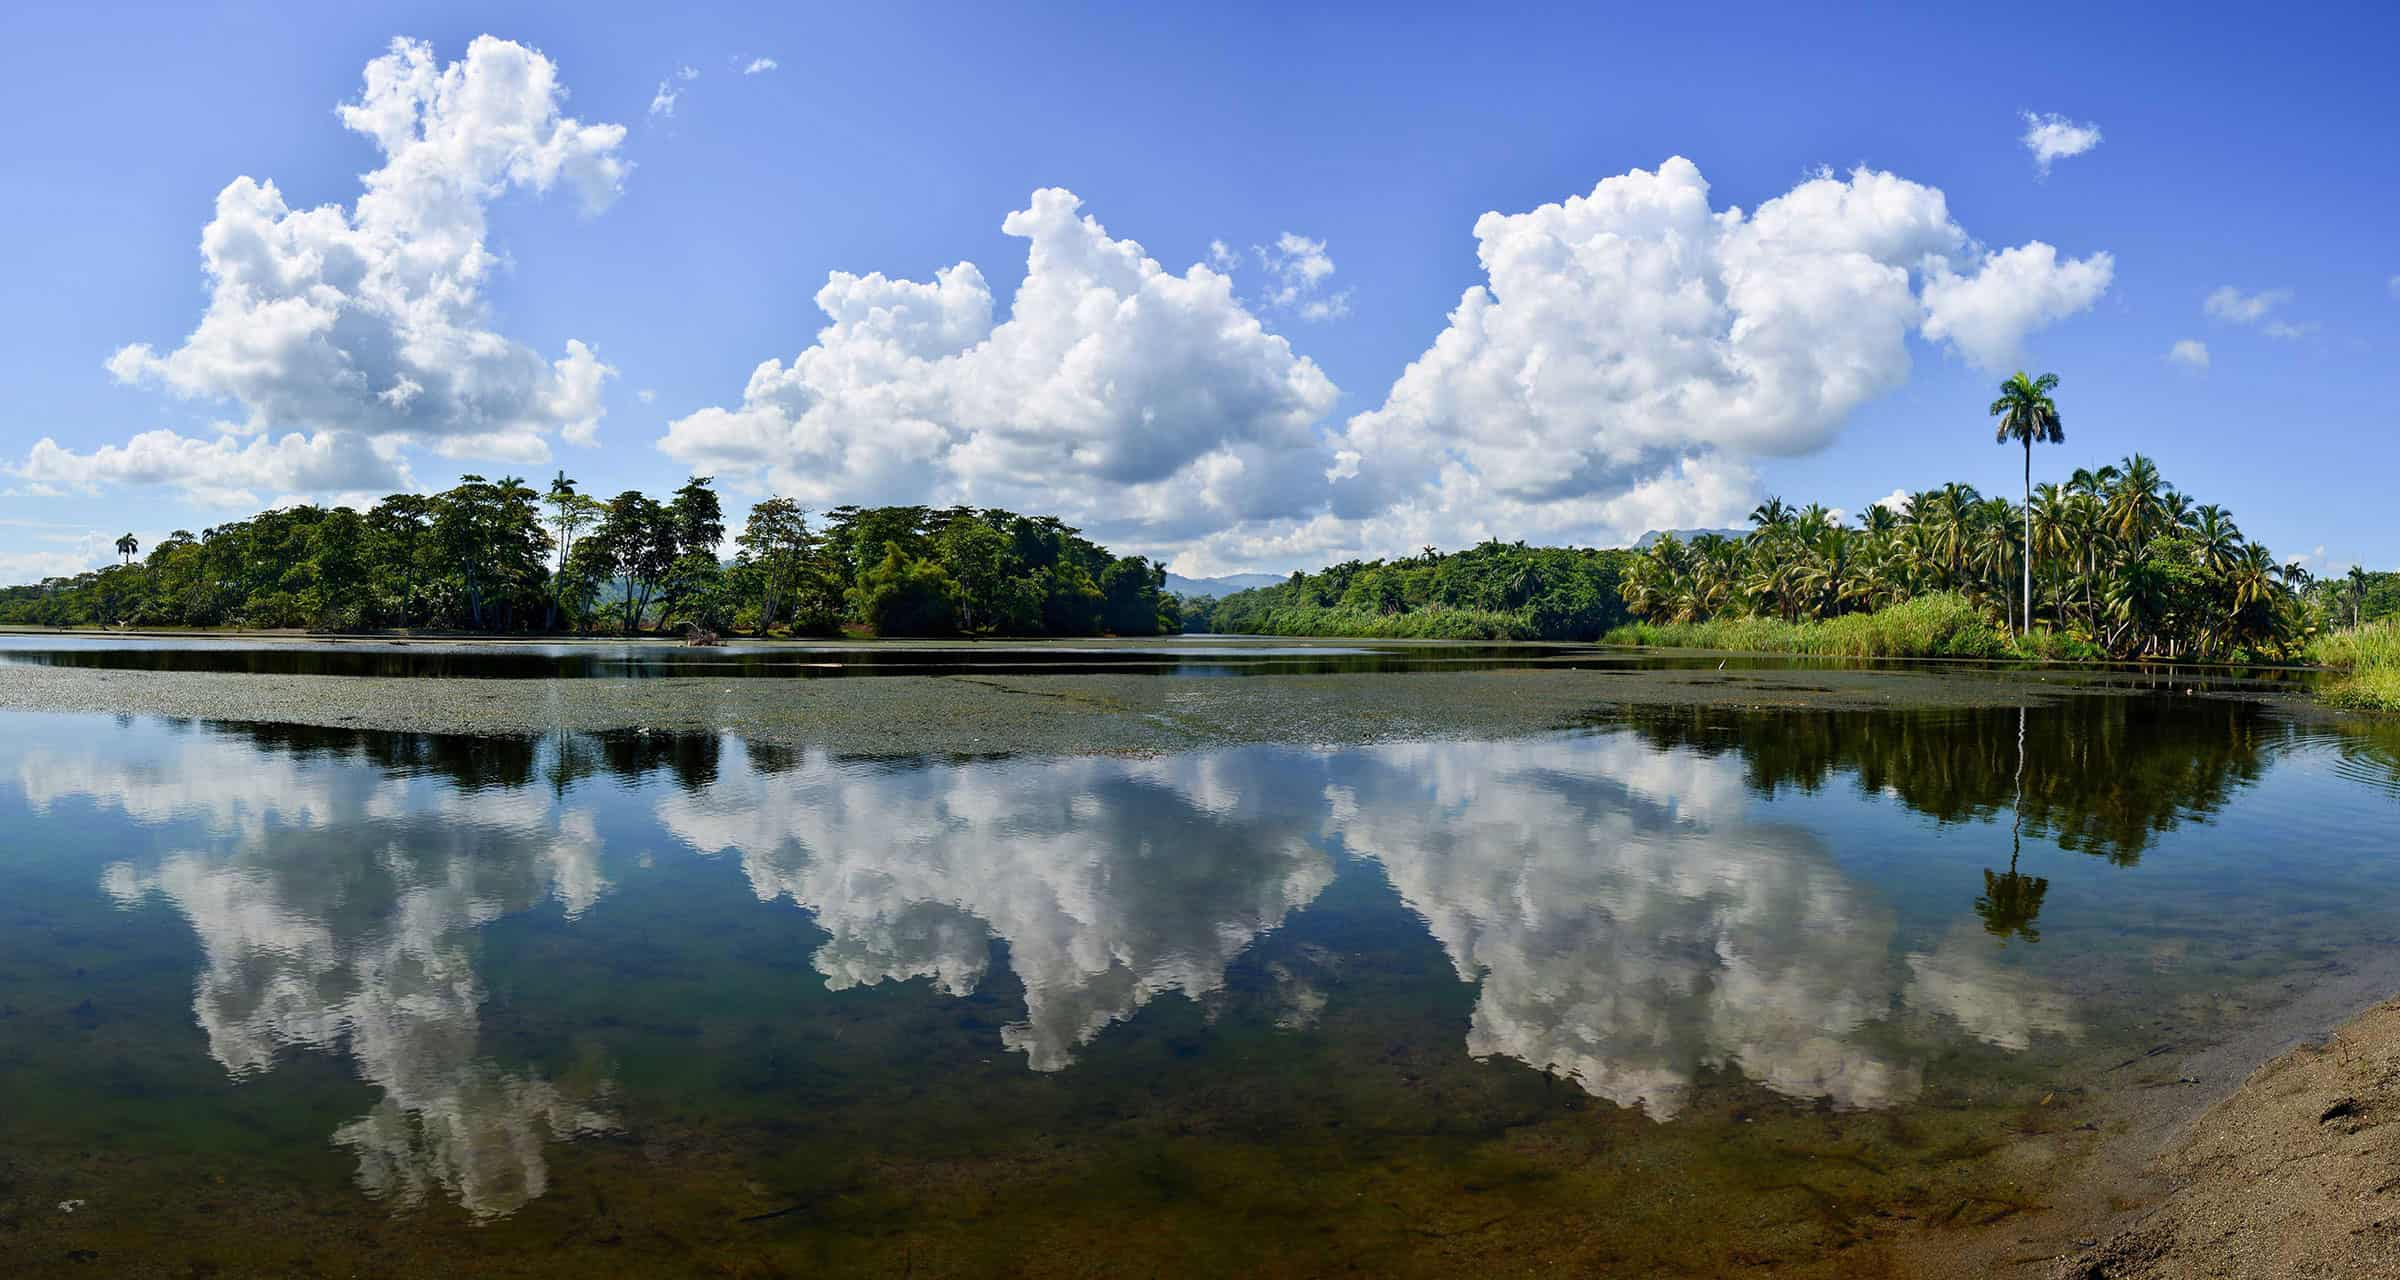 baracoa paysage riviere duaba cuba autrement